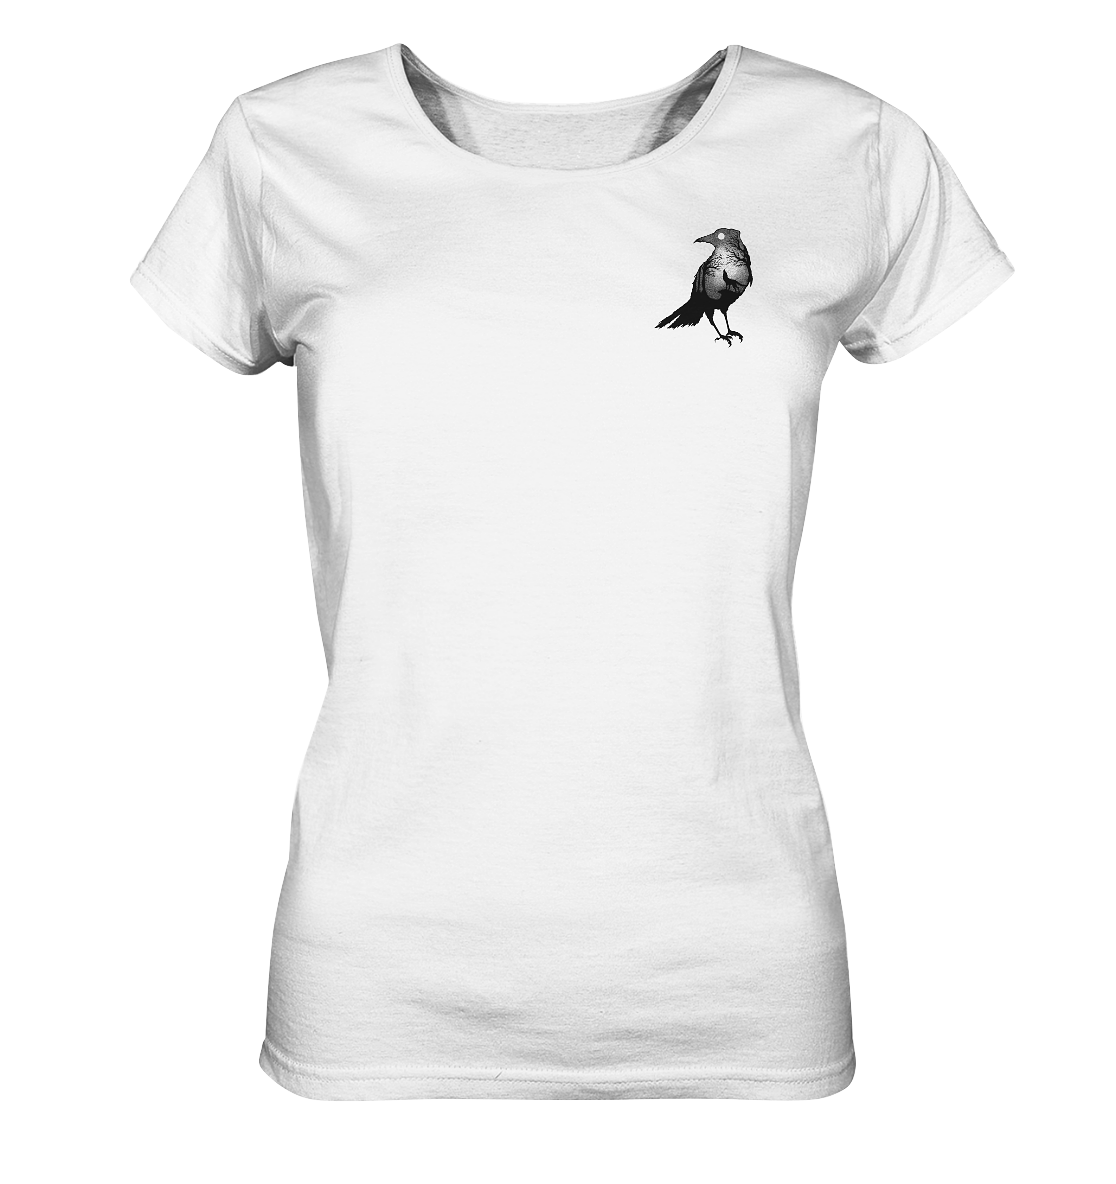 front-ladies-organic-shirt-f8f8f8-1116x-5.png